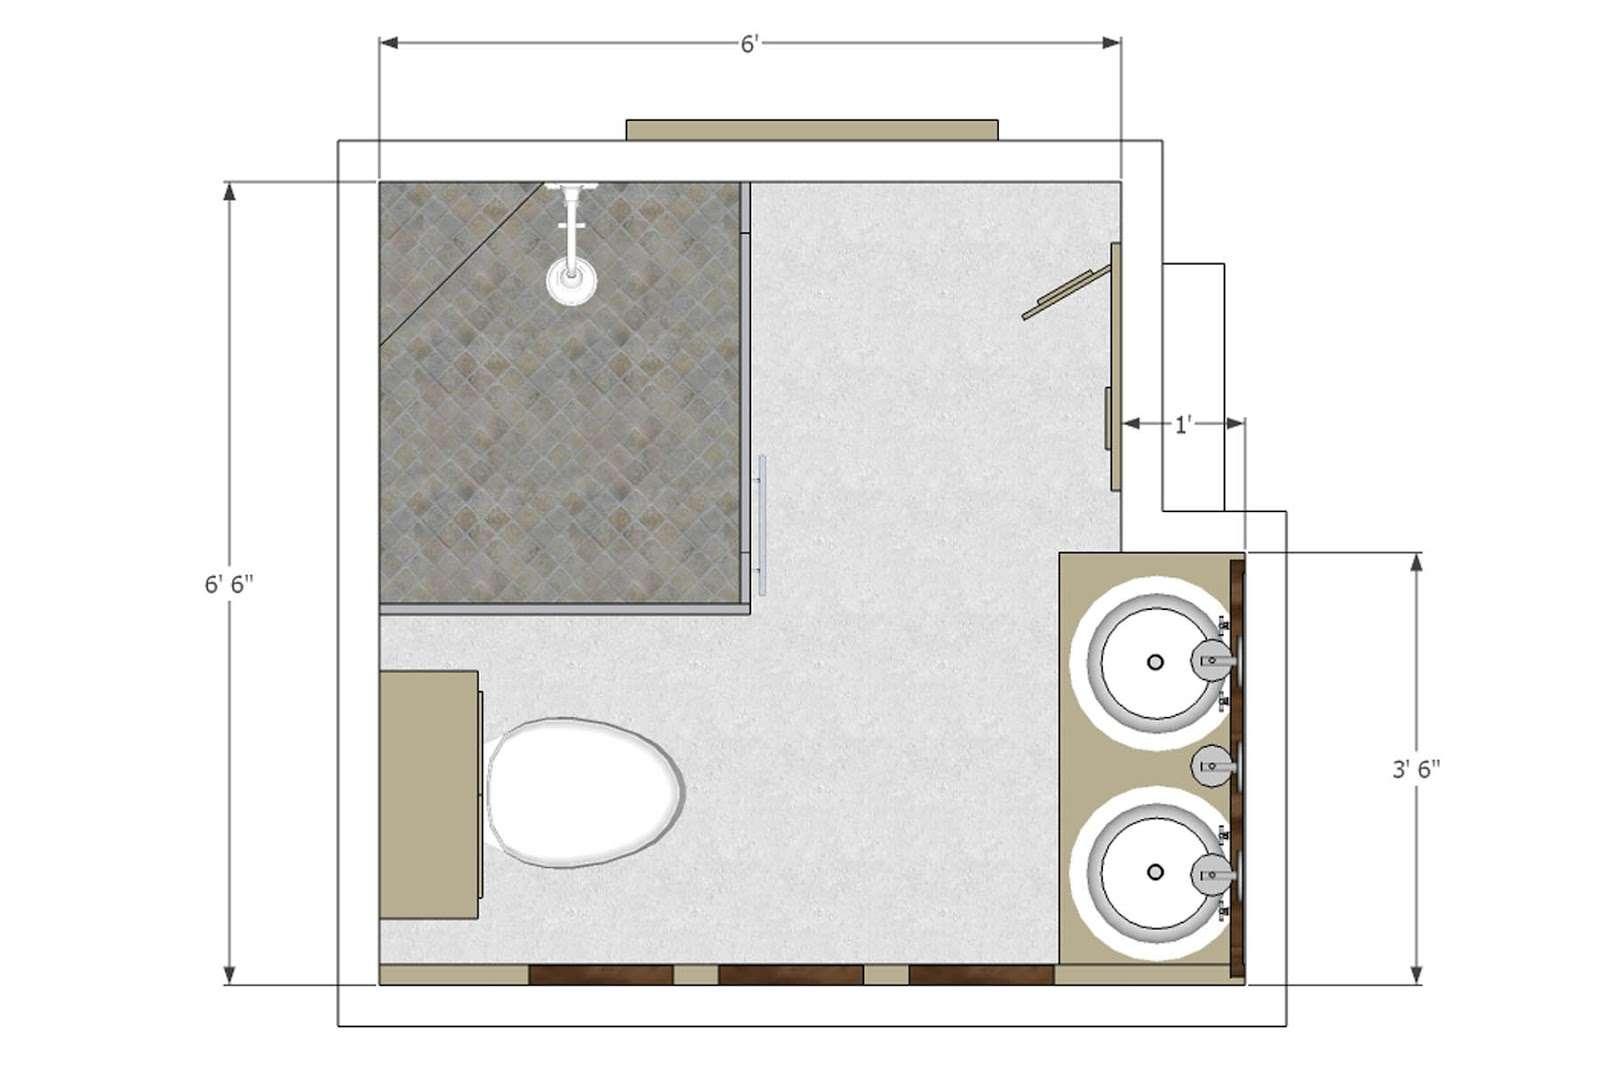 Bathroom Plan Layout Sharing Few Layouts Which Got